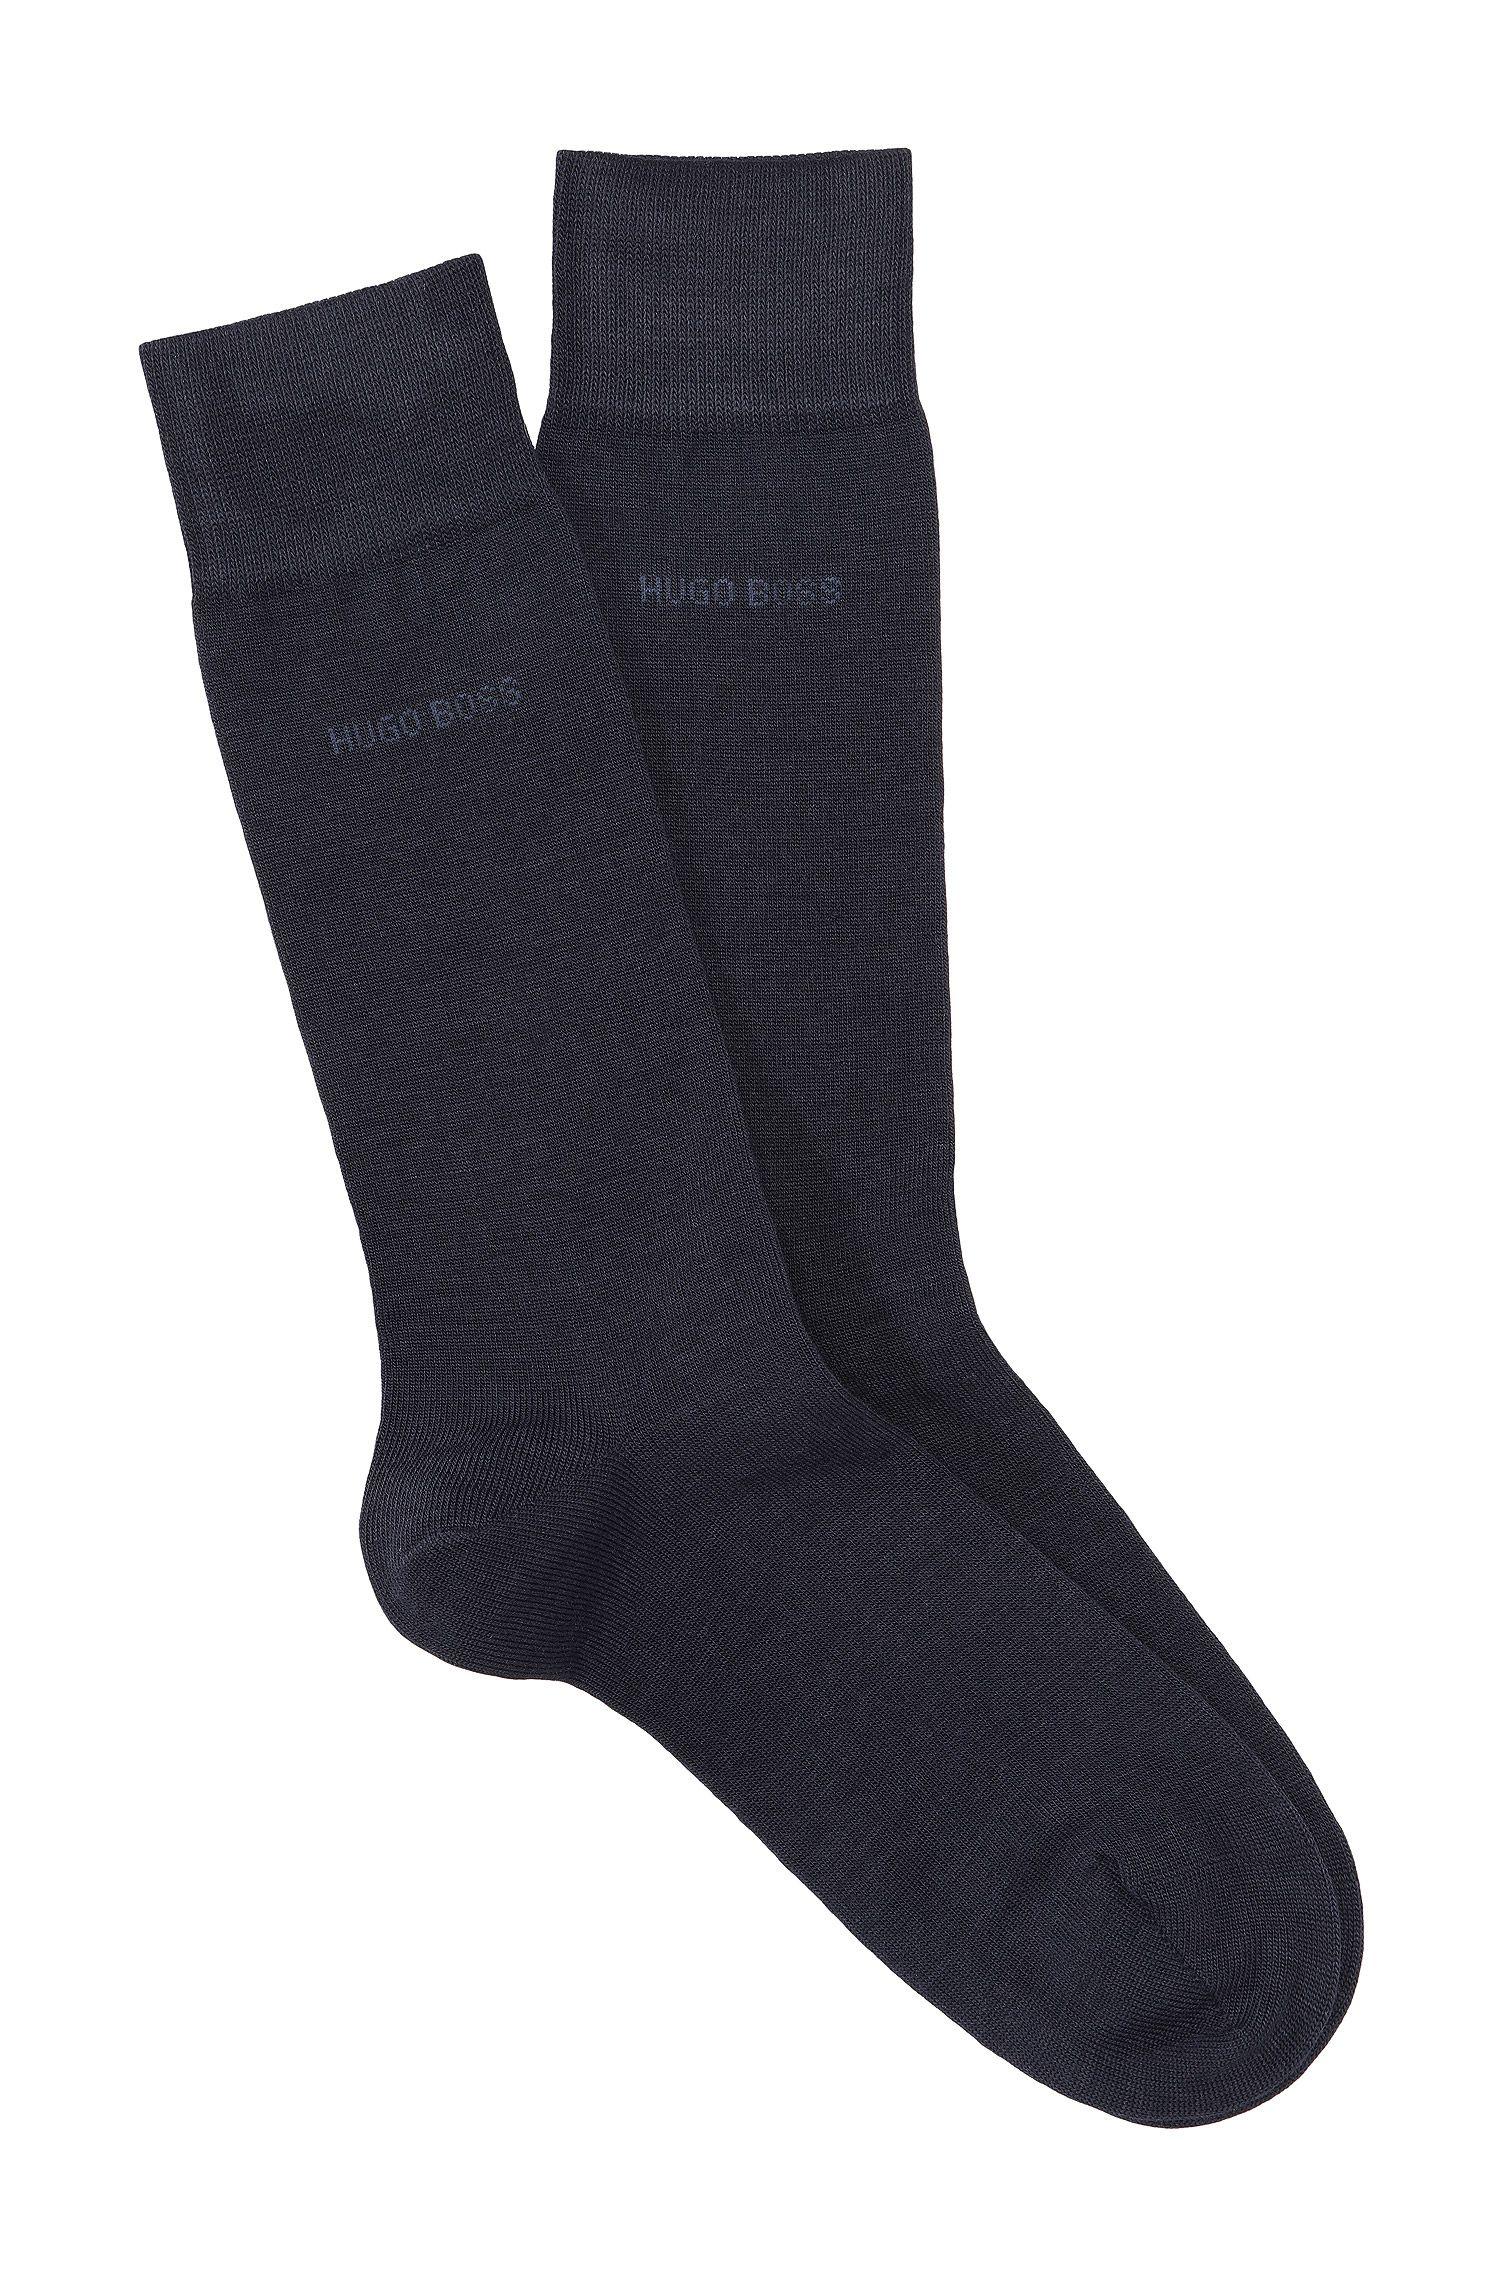 Socken ´Onesize Wo RS Uni` aus Merinowolle-Mix